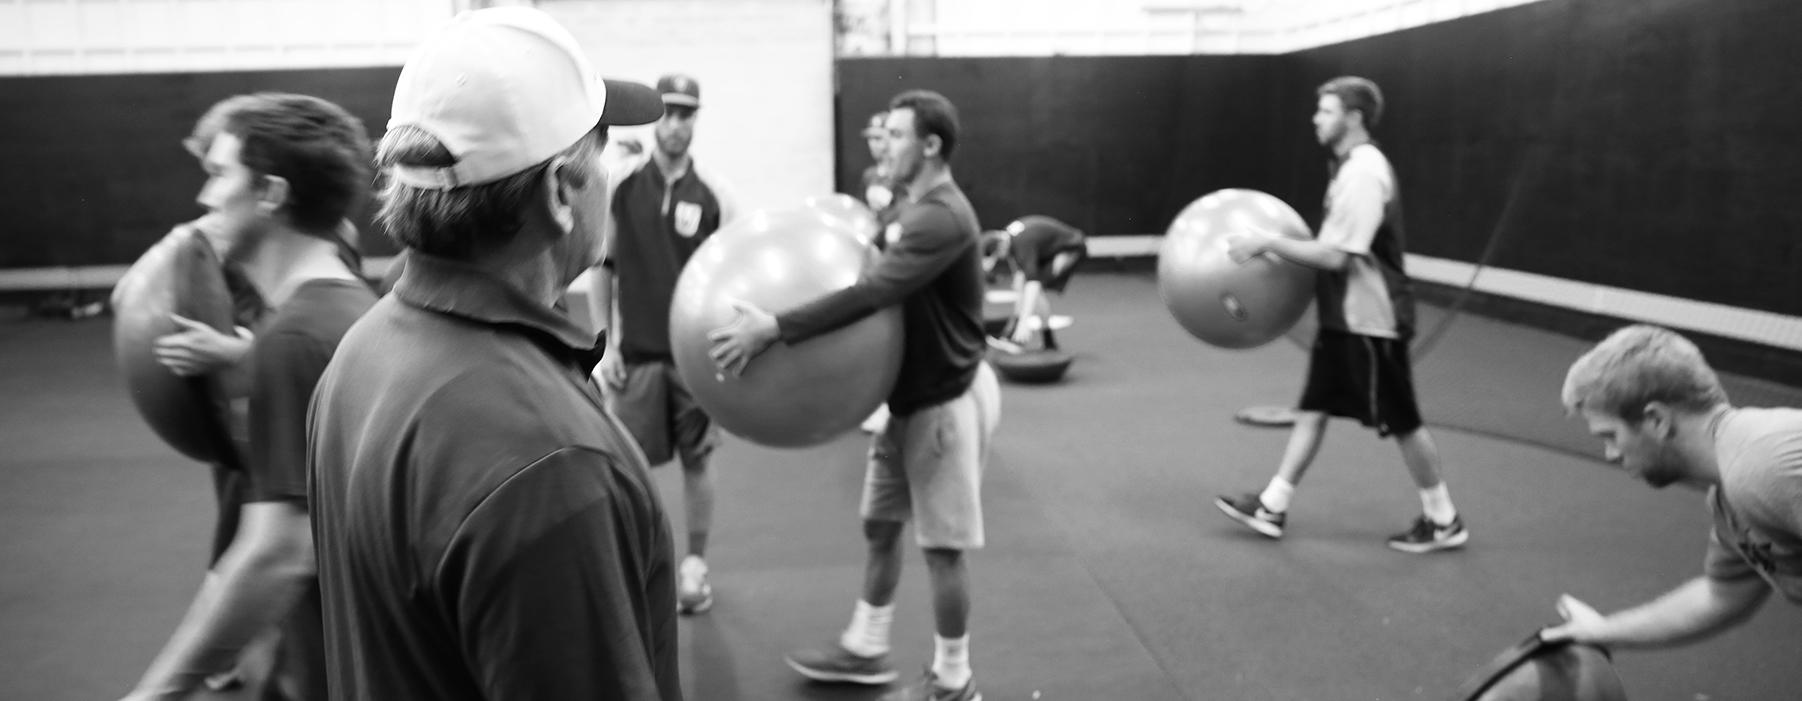 Randy Wishmyer coaching athletes at NPA West